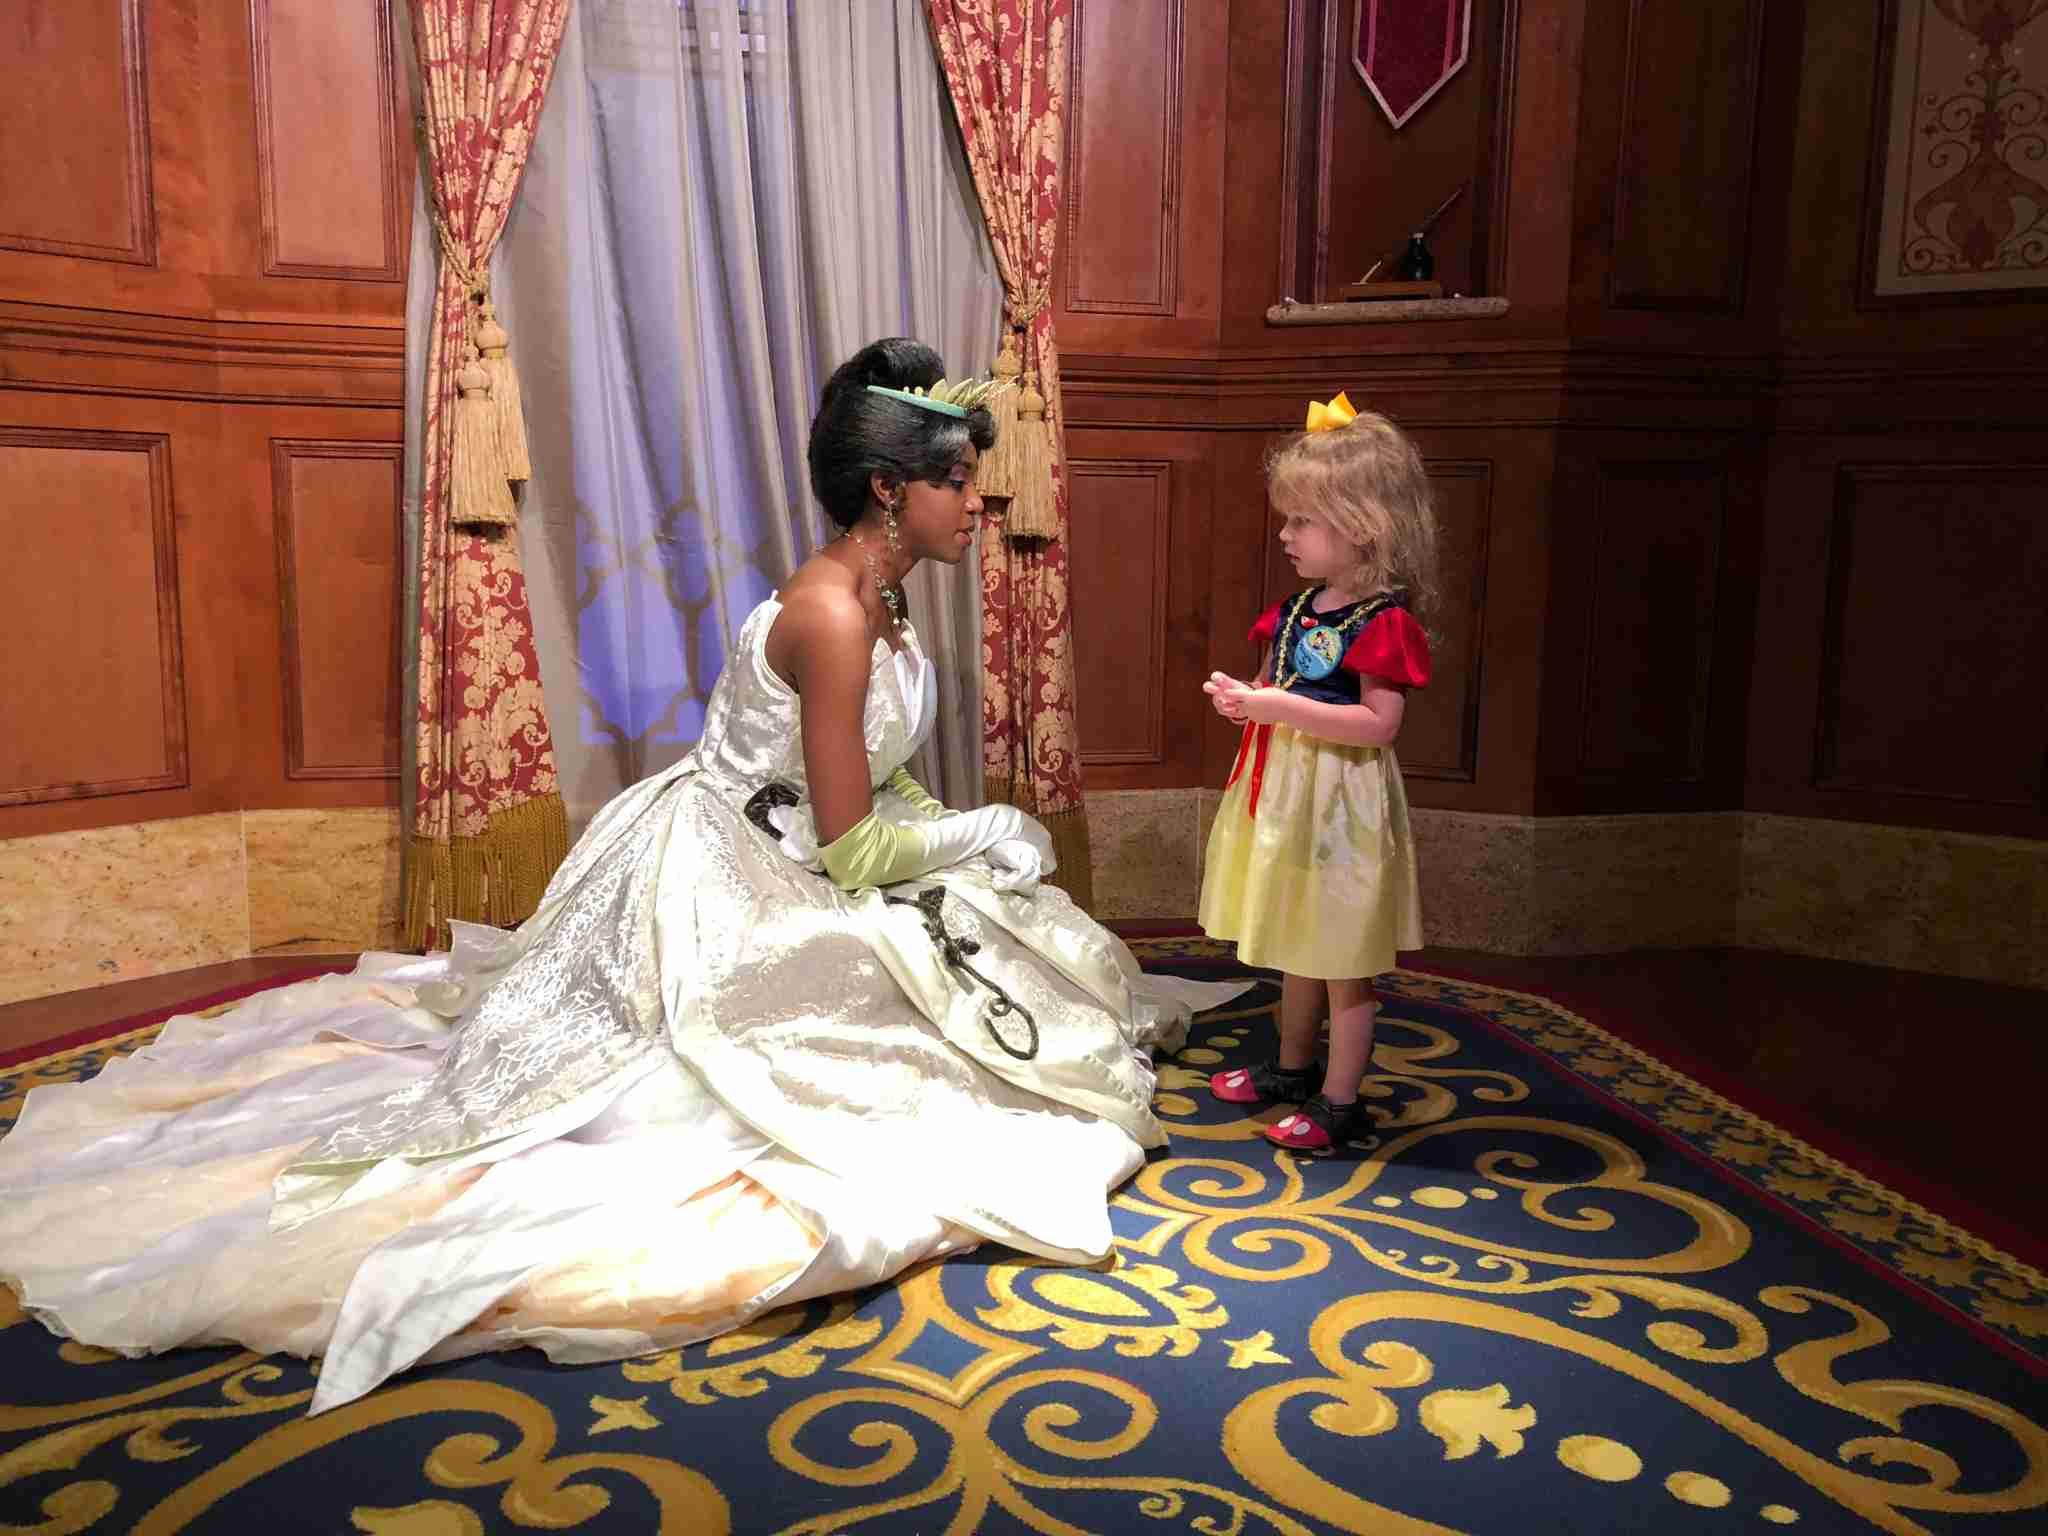 Meeting with Princess Tiana in Magic Kingdom